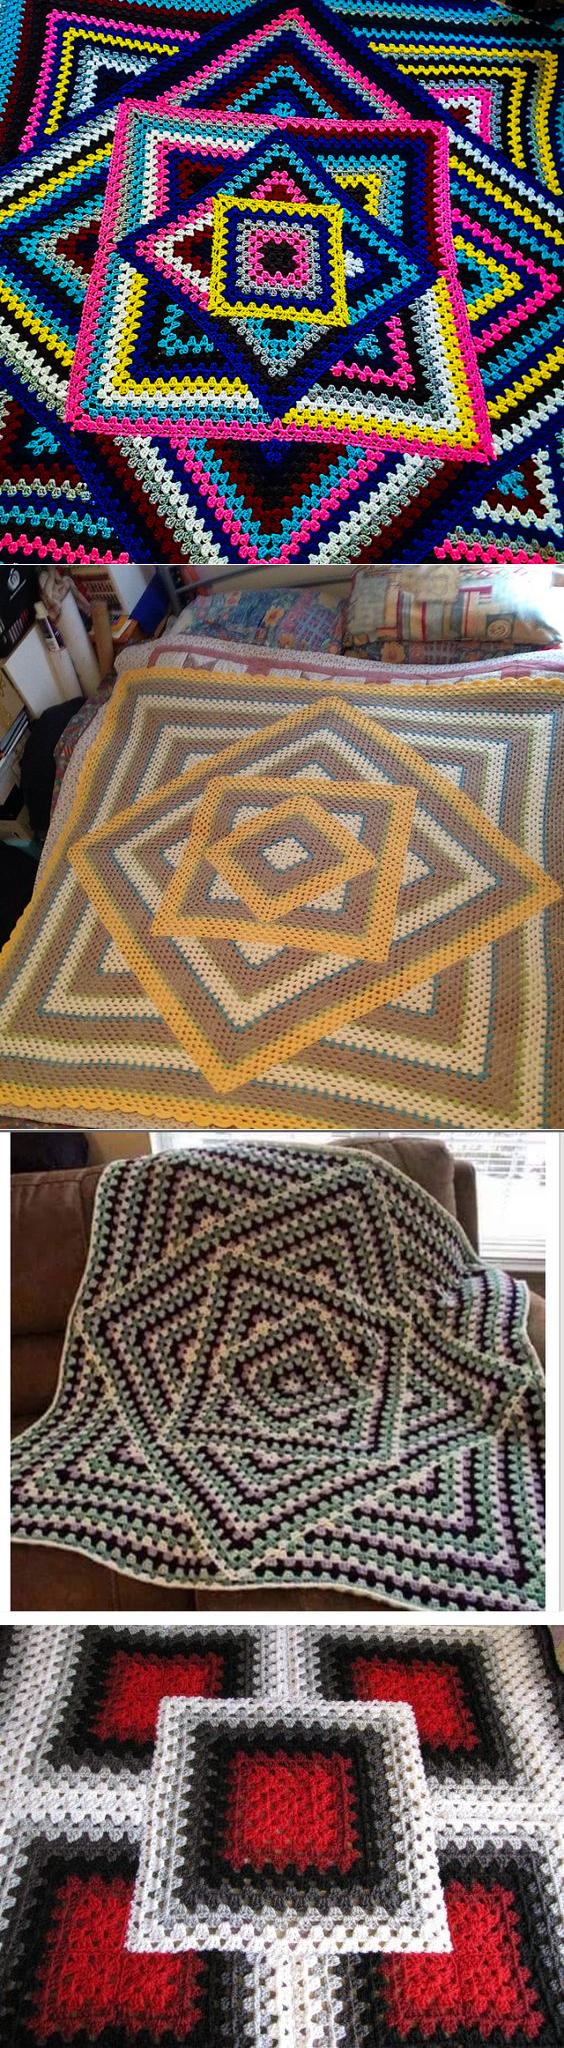 Вязание,плетение,вышивка для дома | Pinterest | Decken, Häkeln und ...